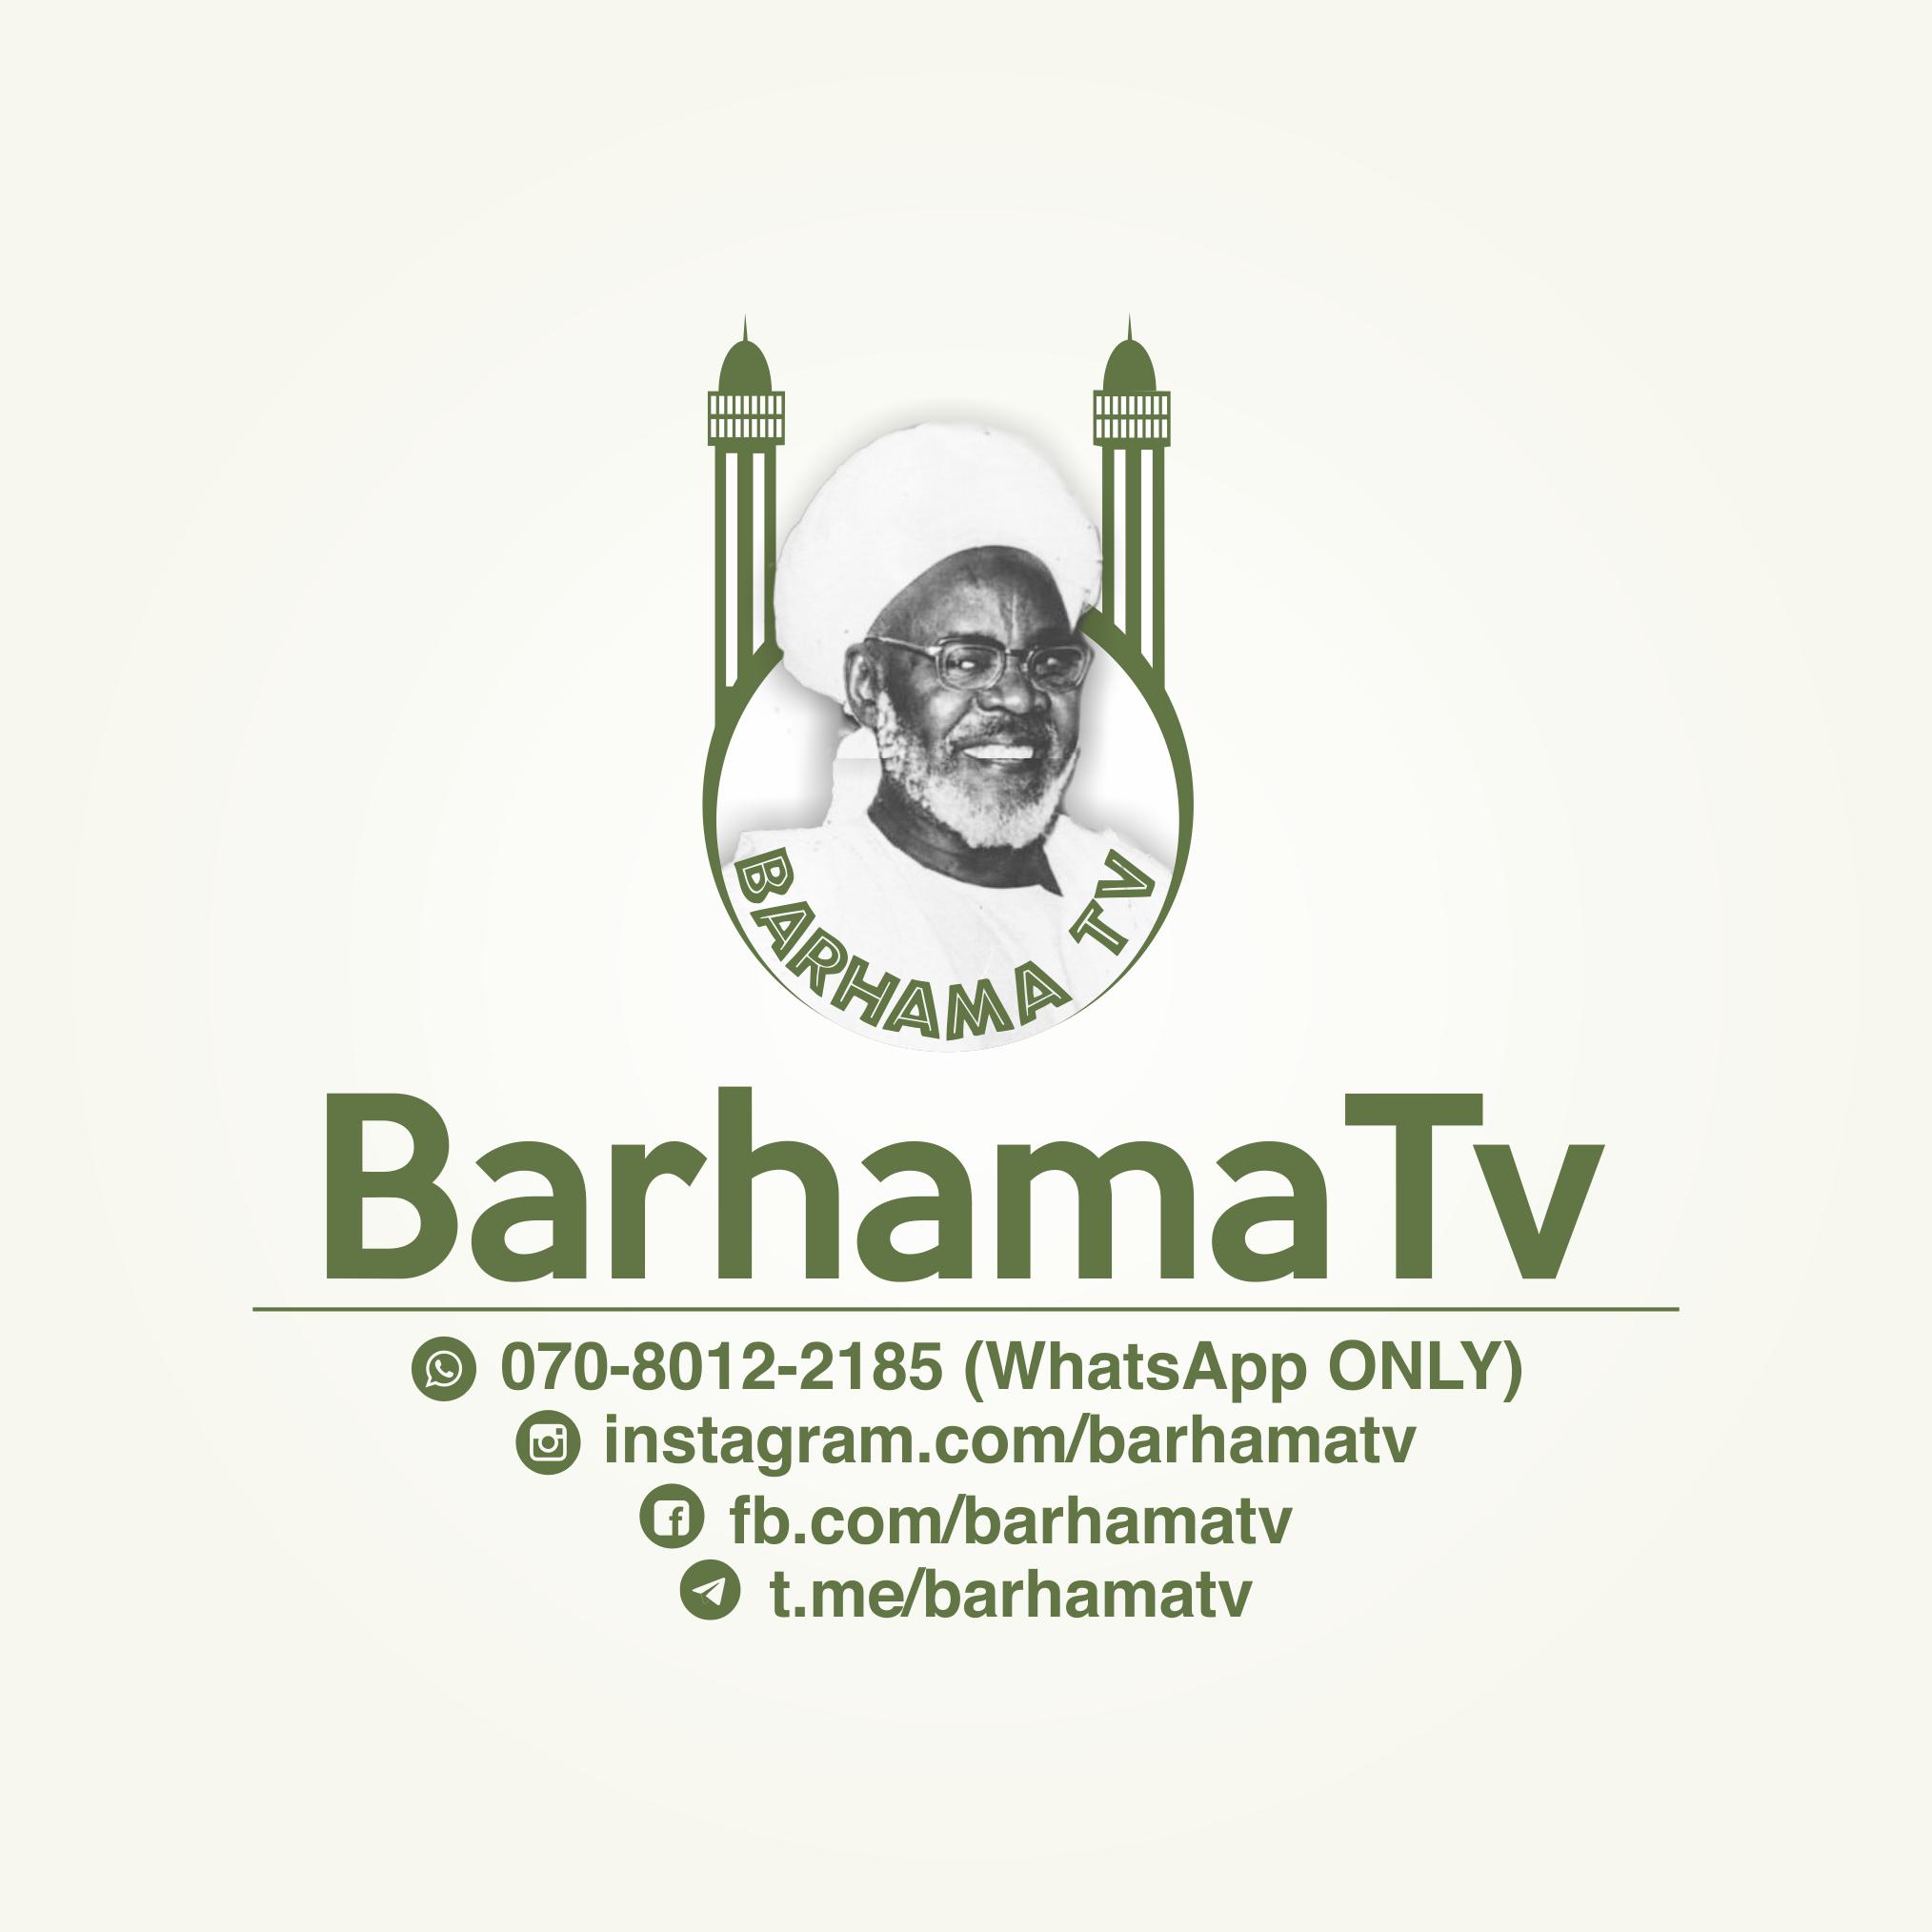 Barhama TV